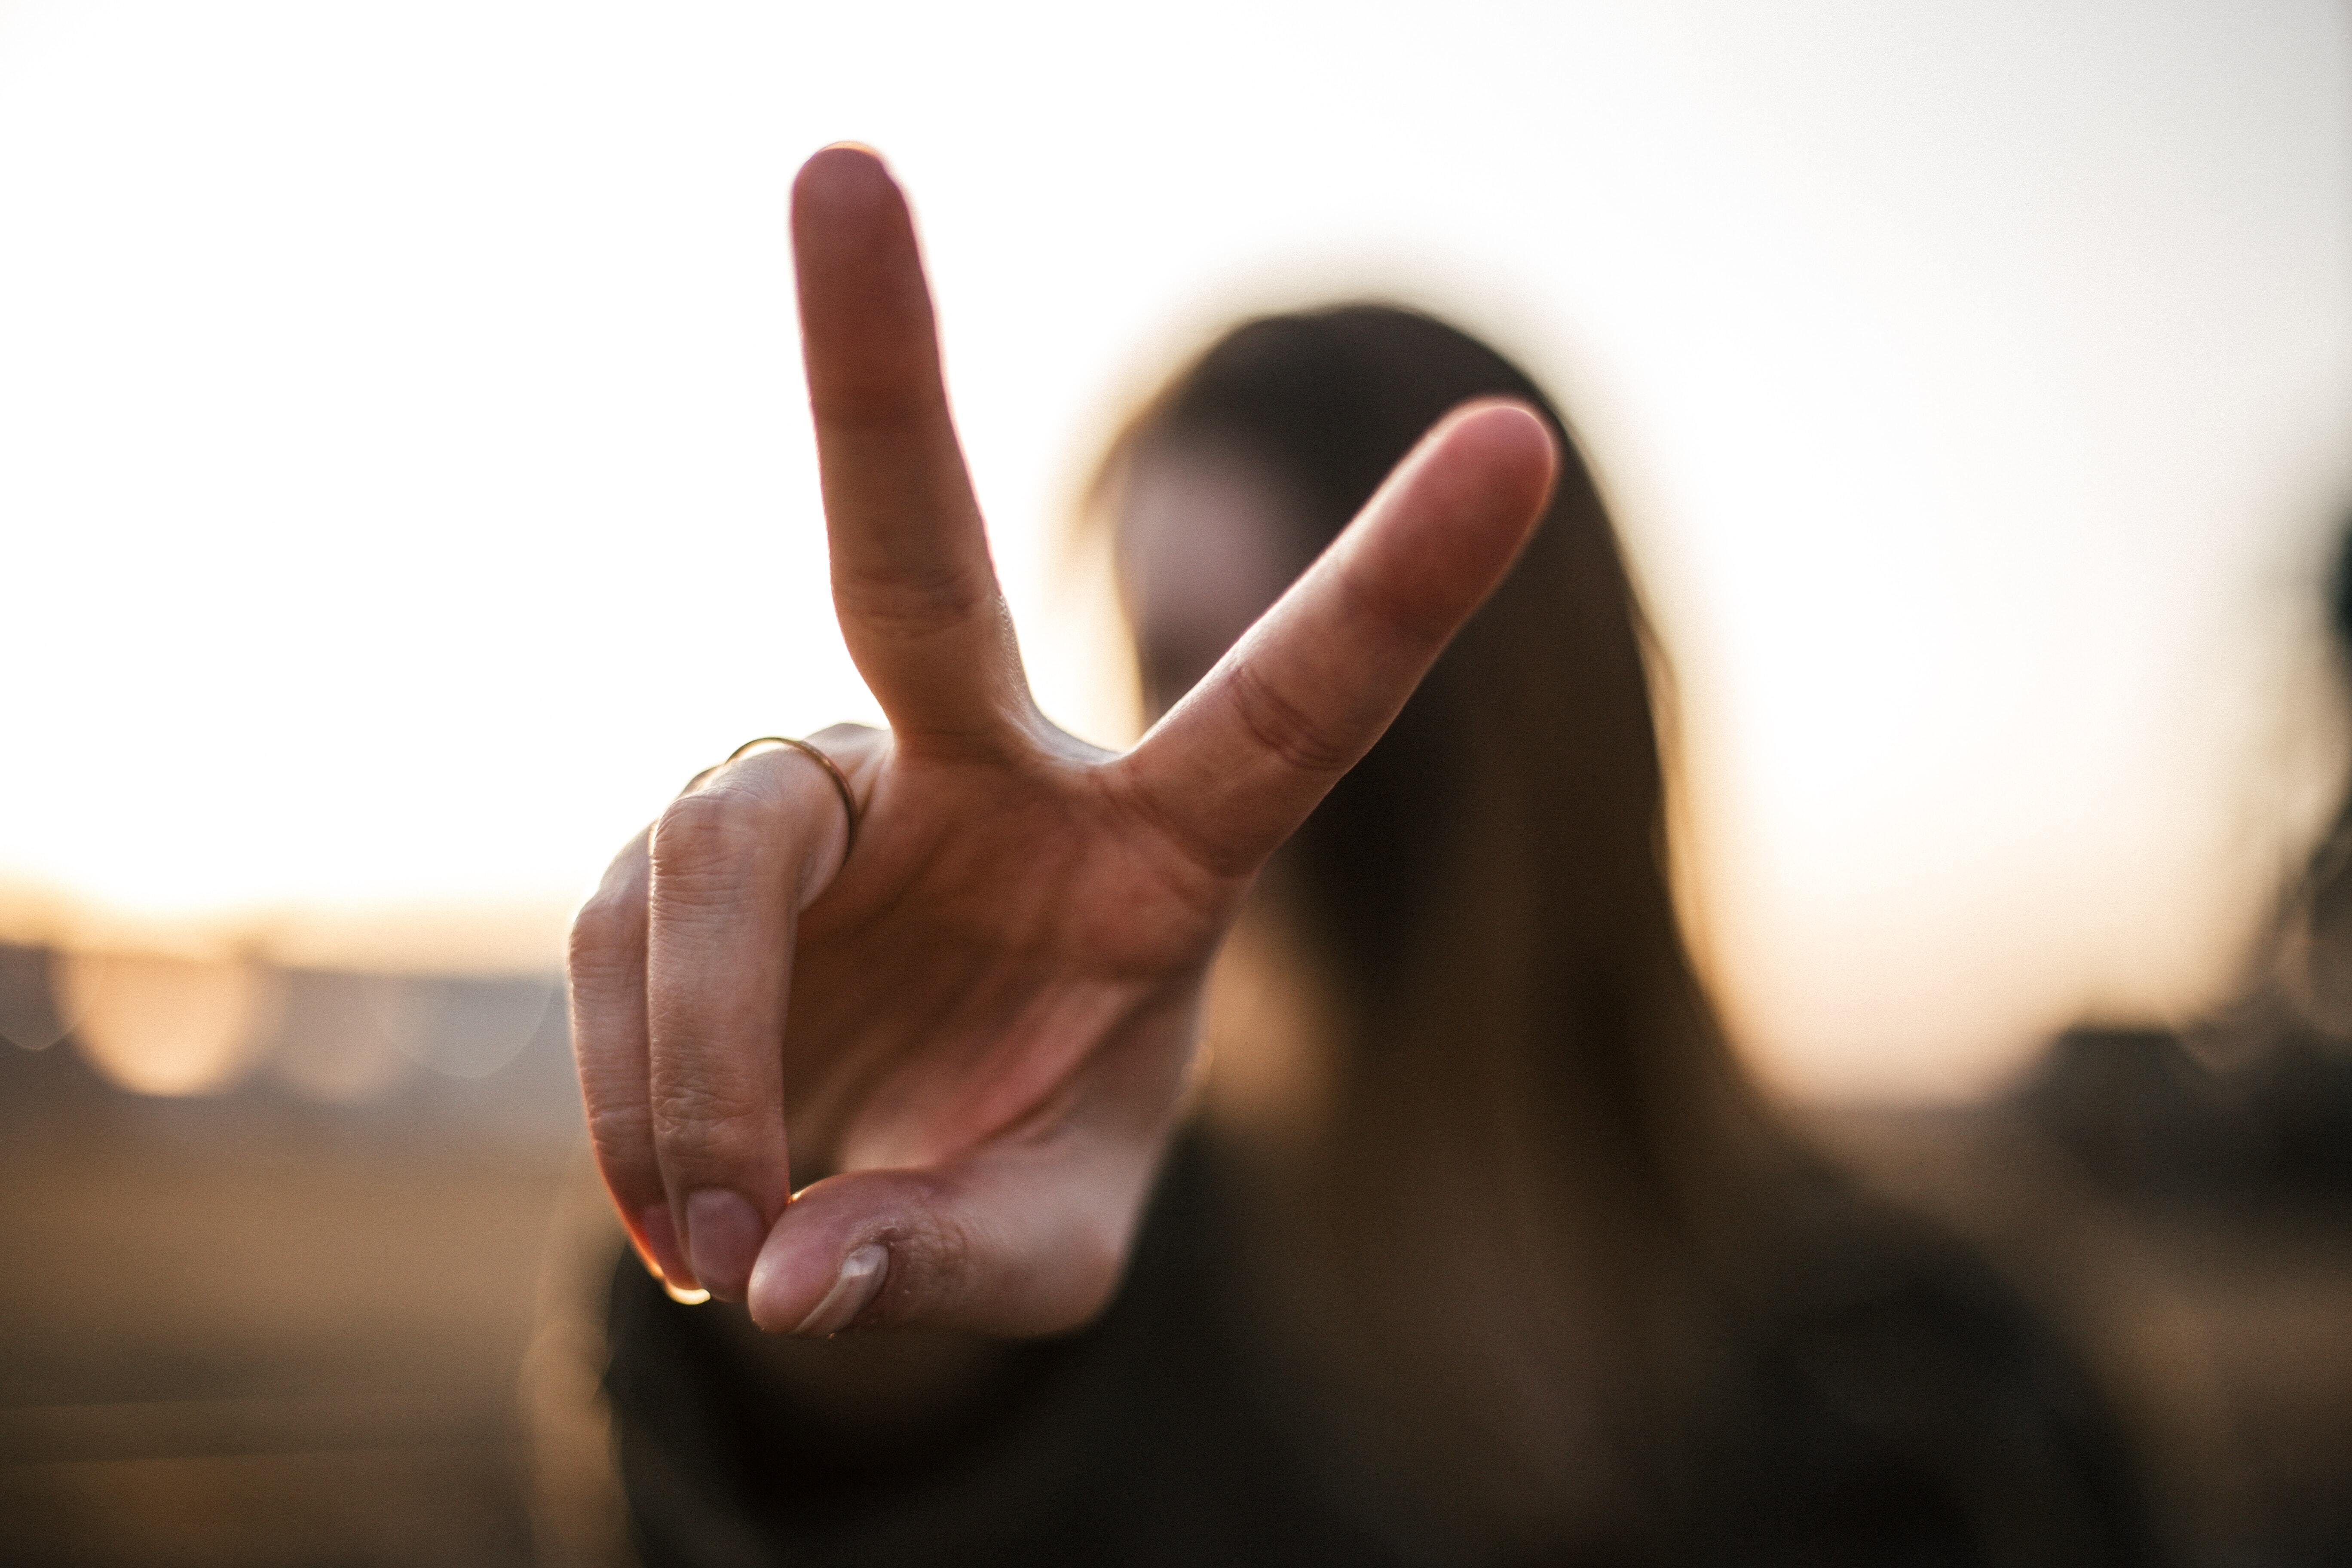 Priscilla Du-Preez Via Unsplash Peace symbol